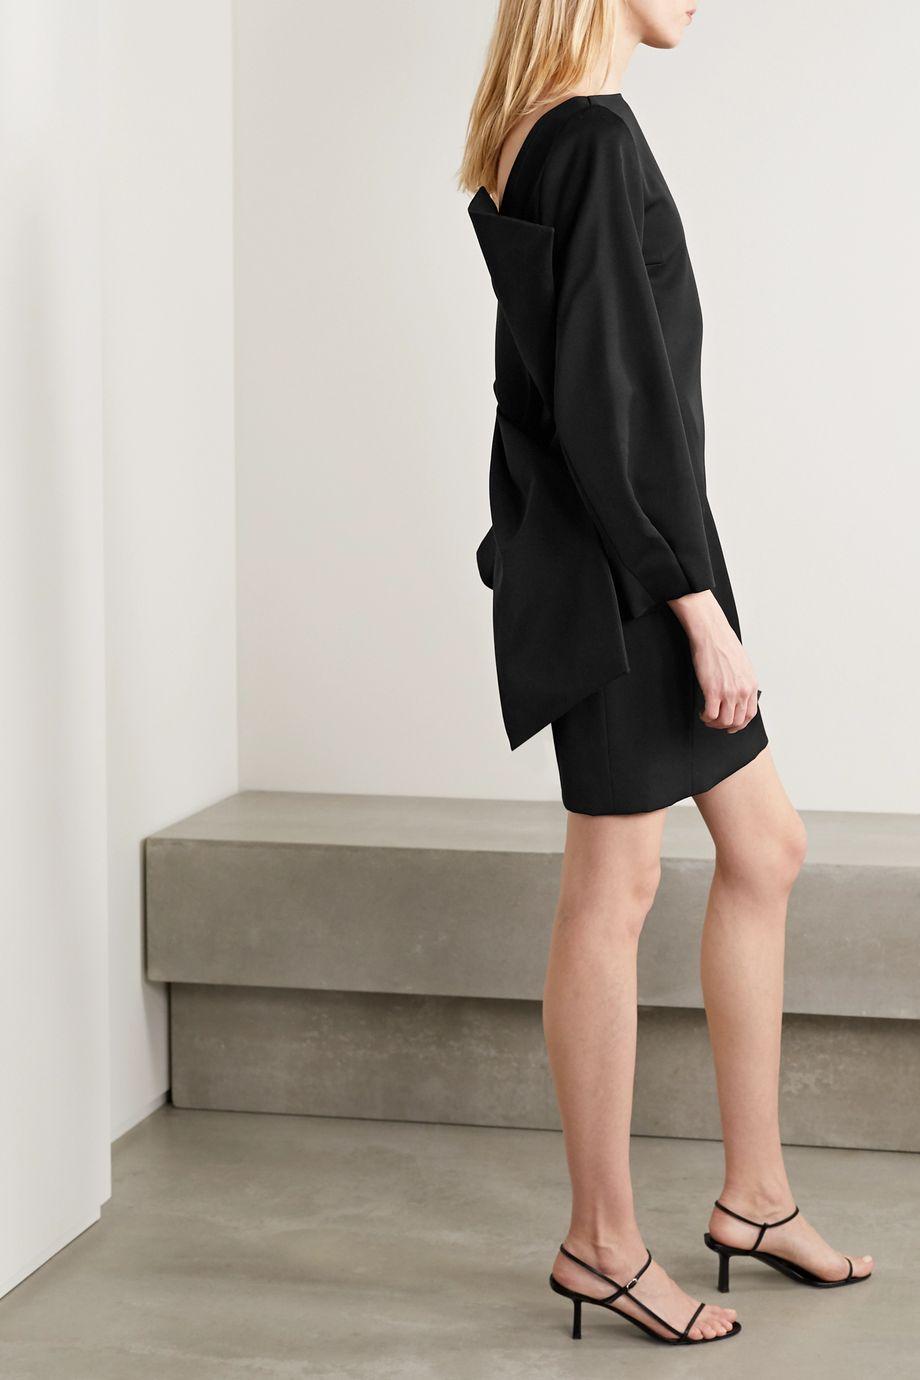 Nina Ricci Bow-embellished grain de poudre wool mini dress